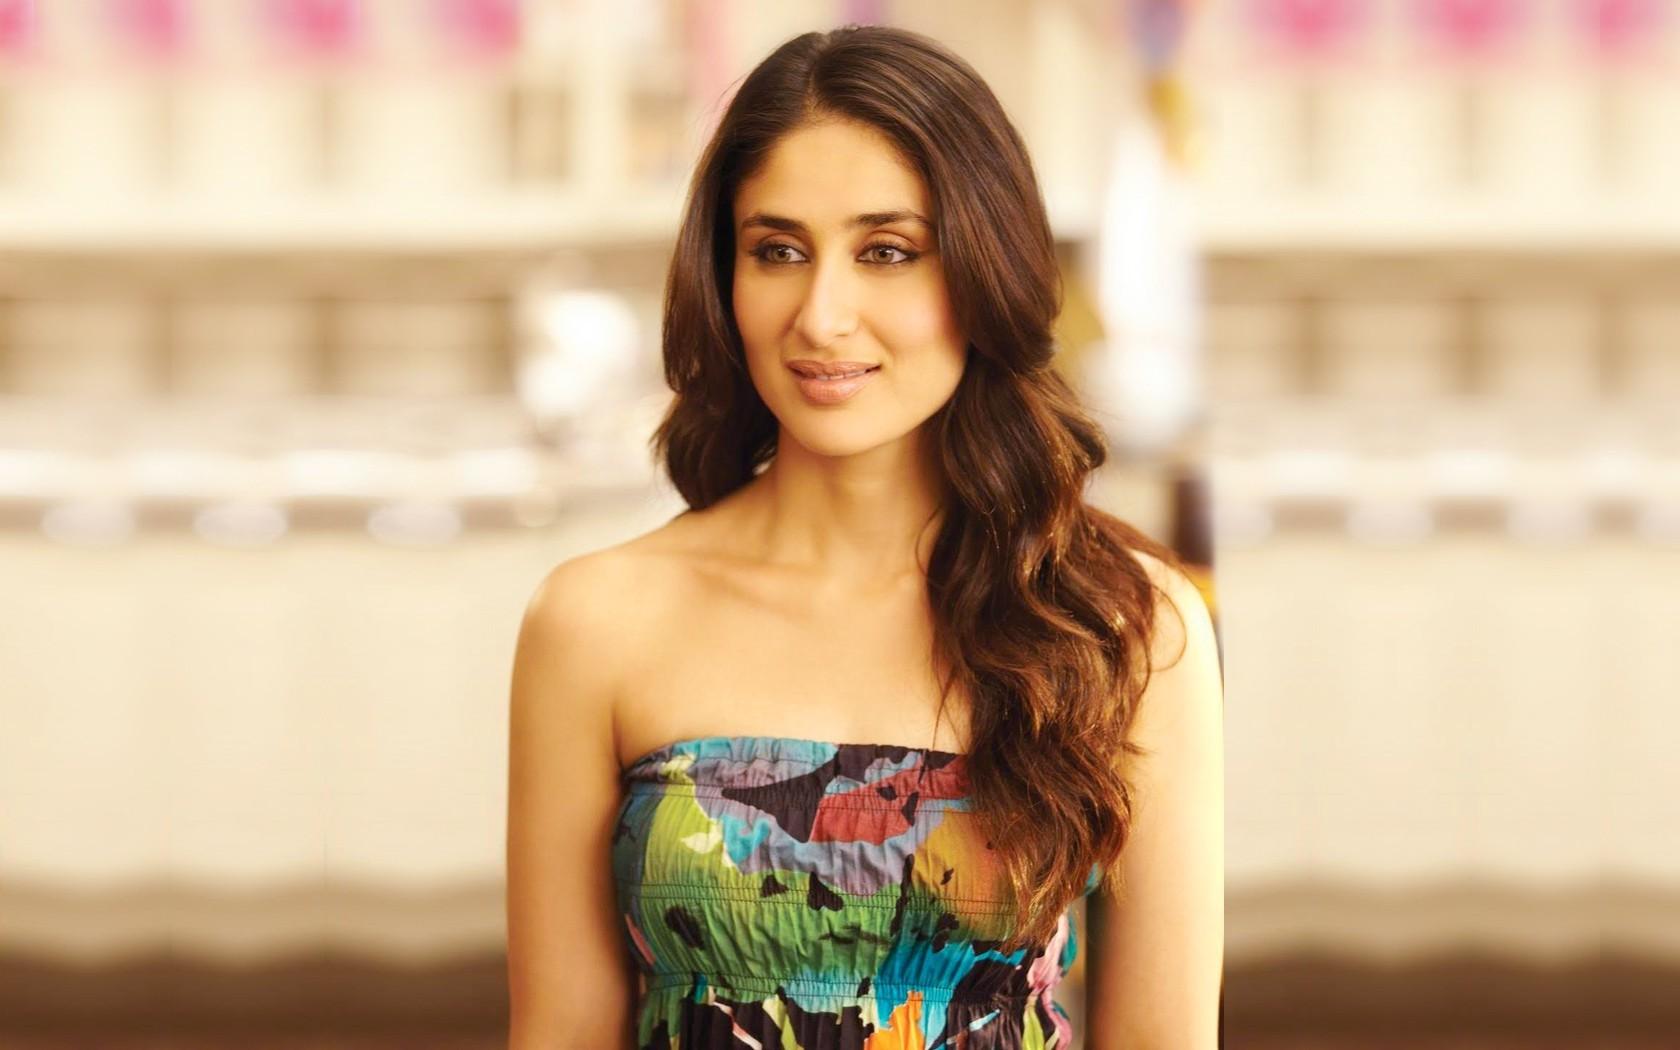 Kareena Kapoor HD Wallpapers 2015 ImageTownin 1680x1050